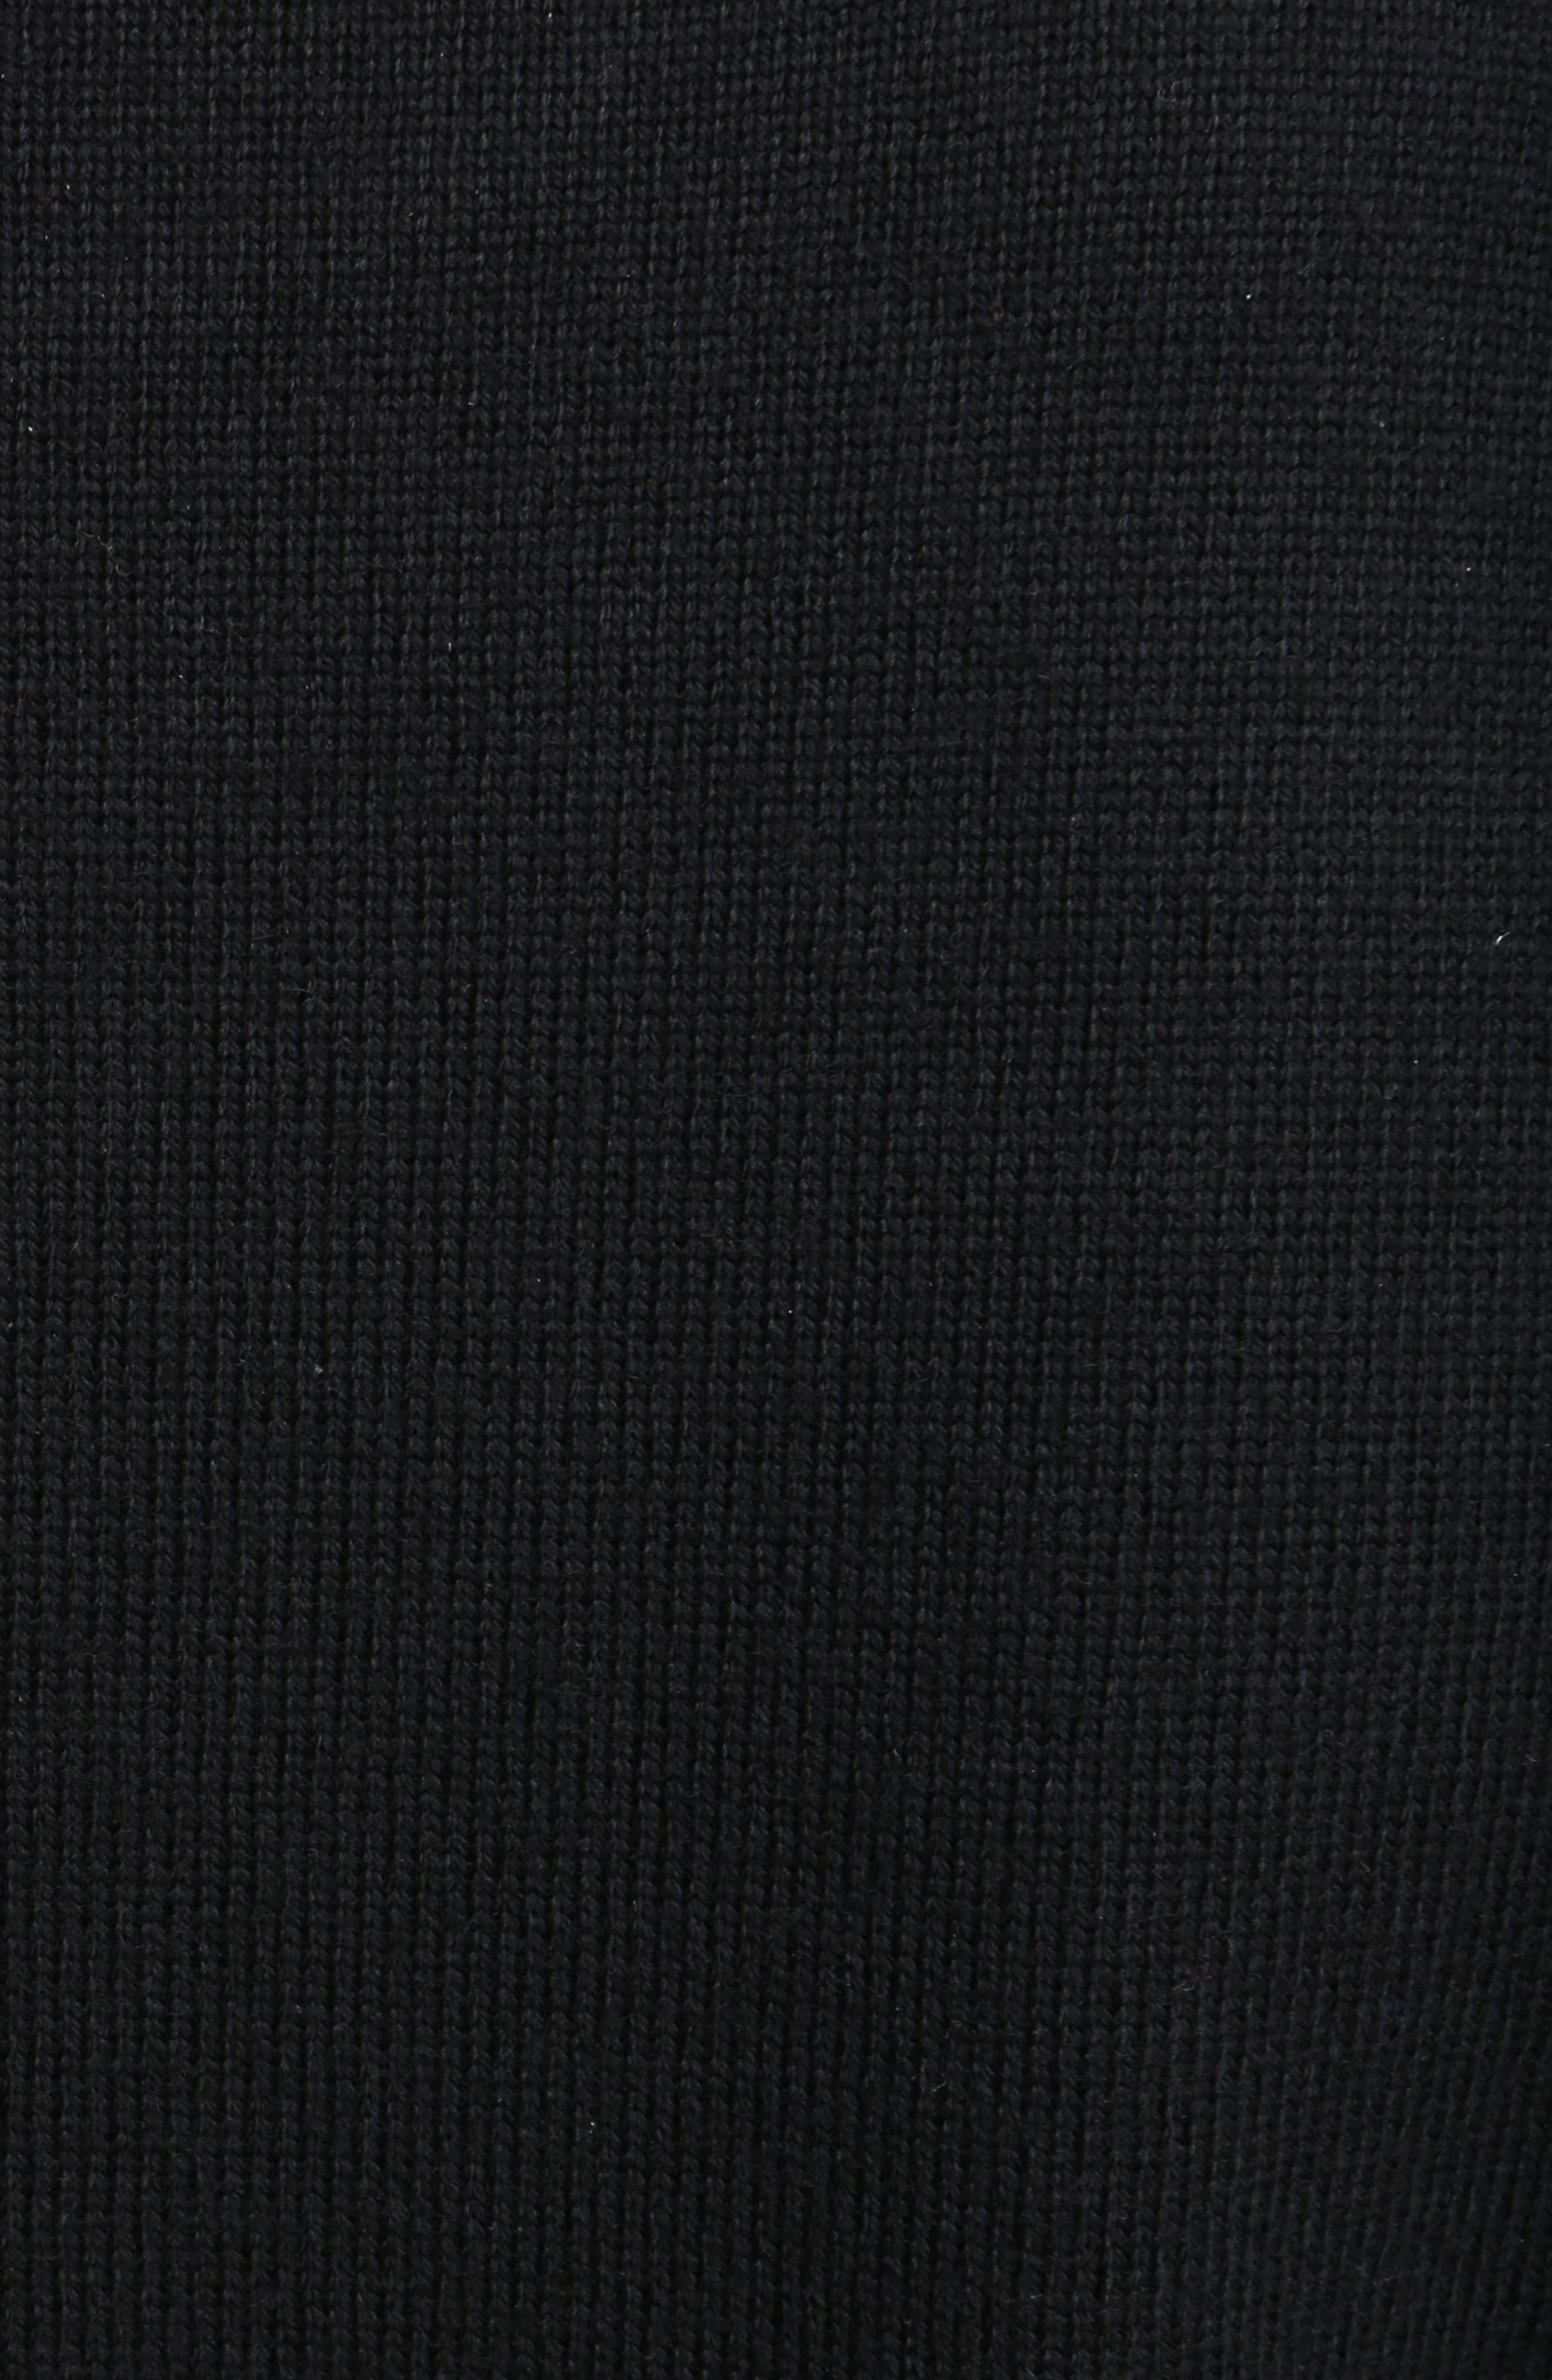 Alternate Image 3  - Givenchy Star Embellished Wool Sweater